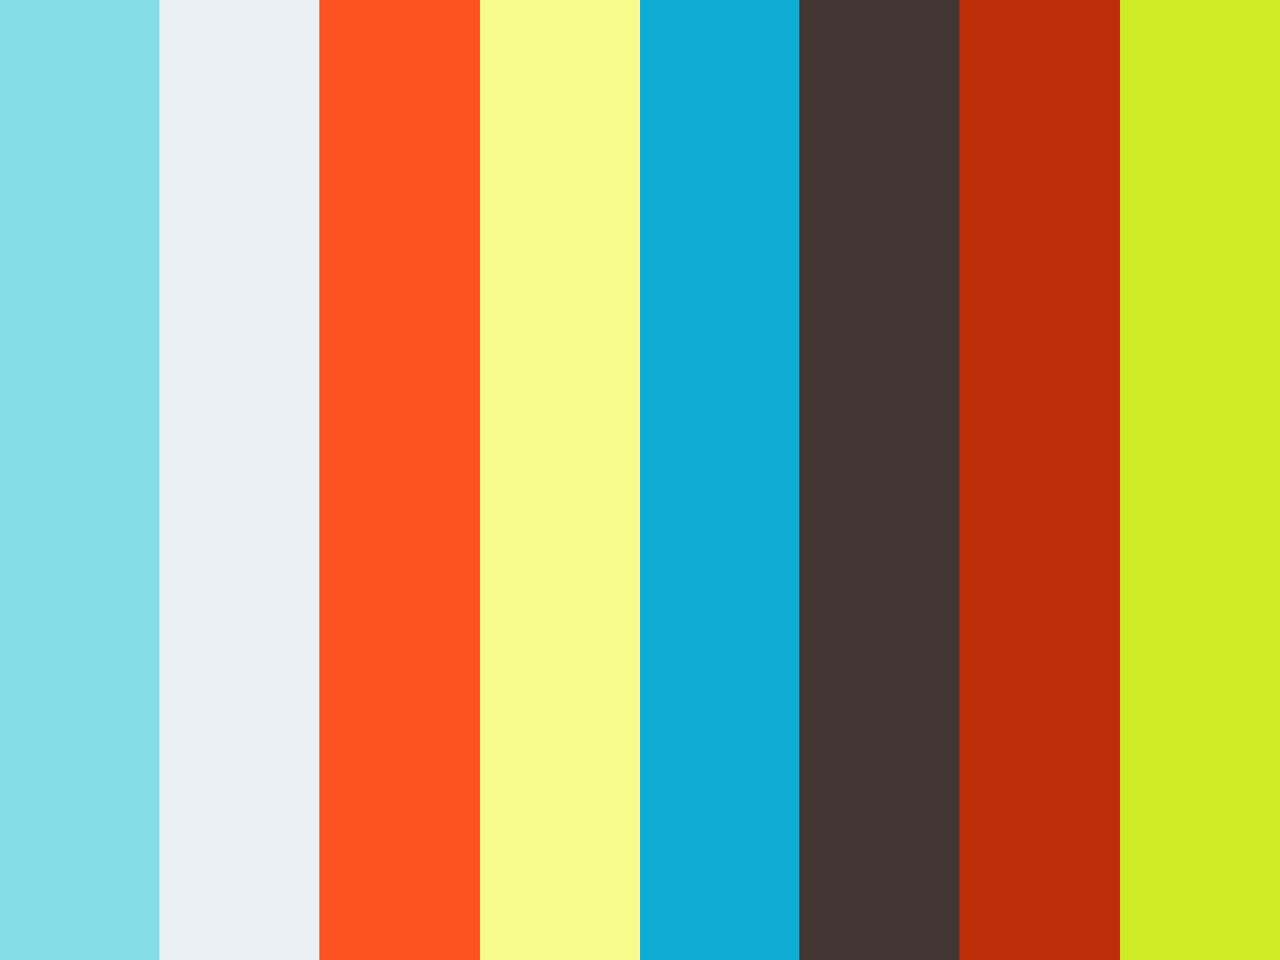 Soji Ogunnaike Colourist reel